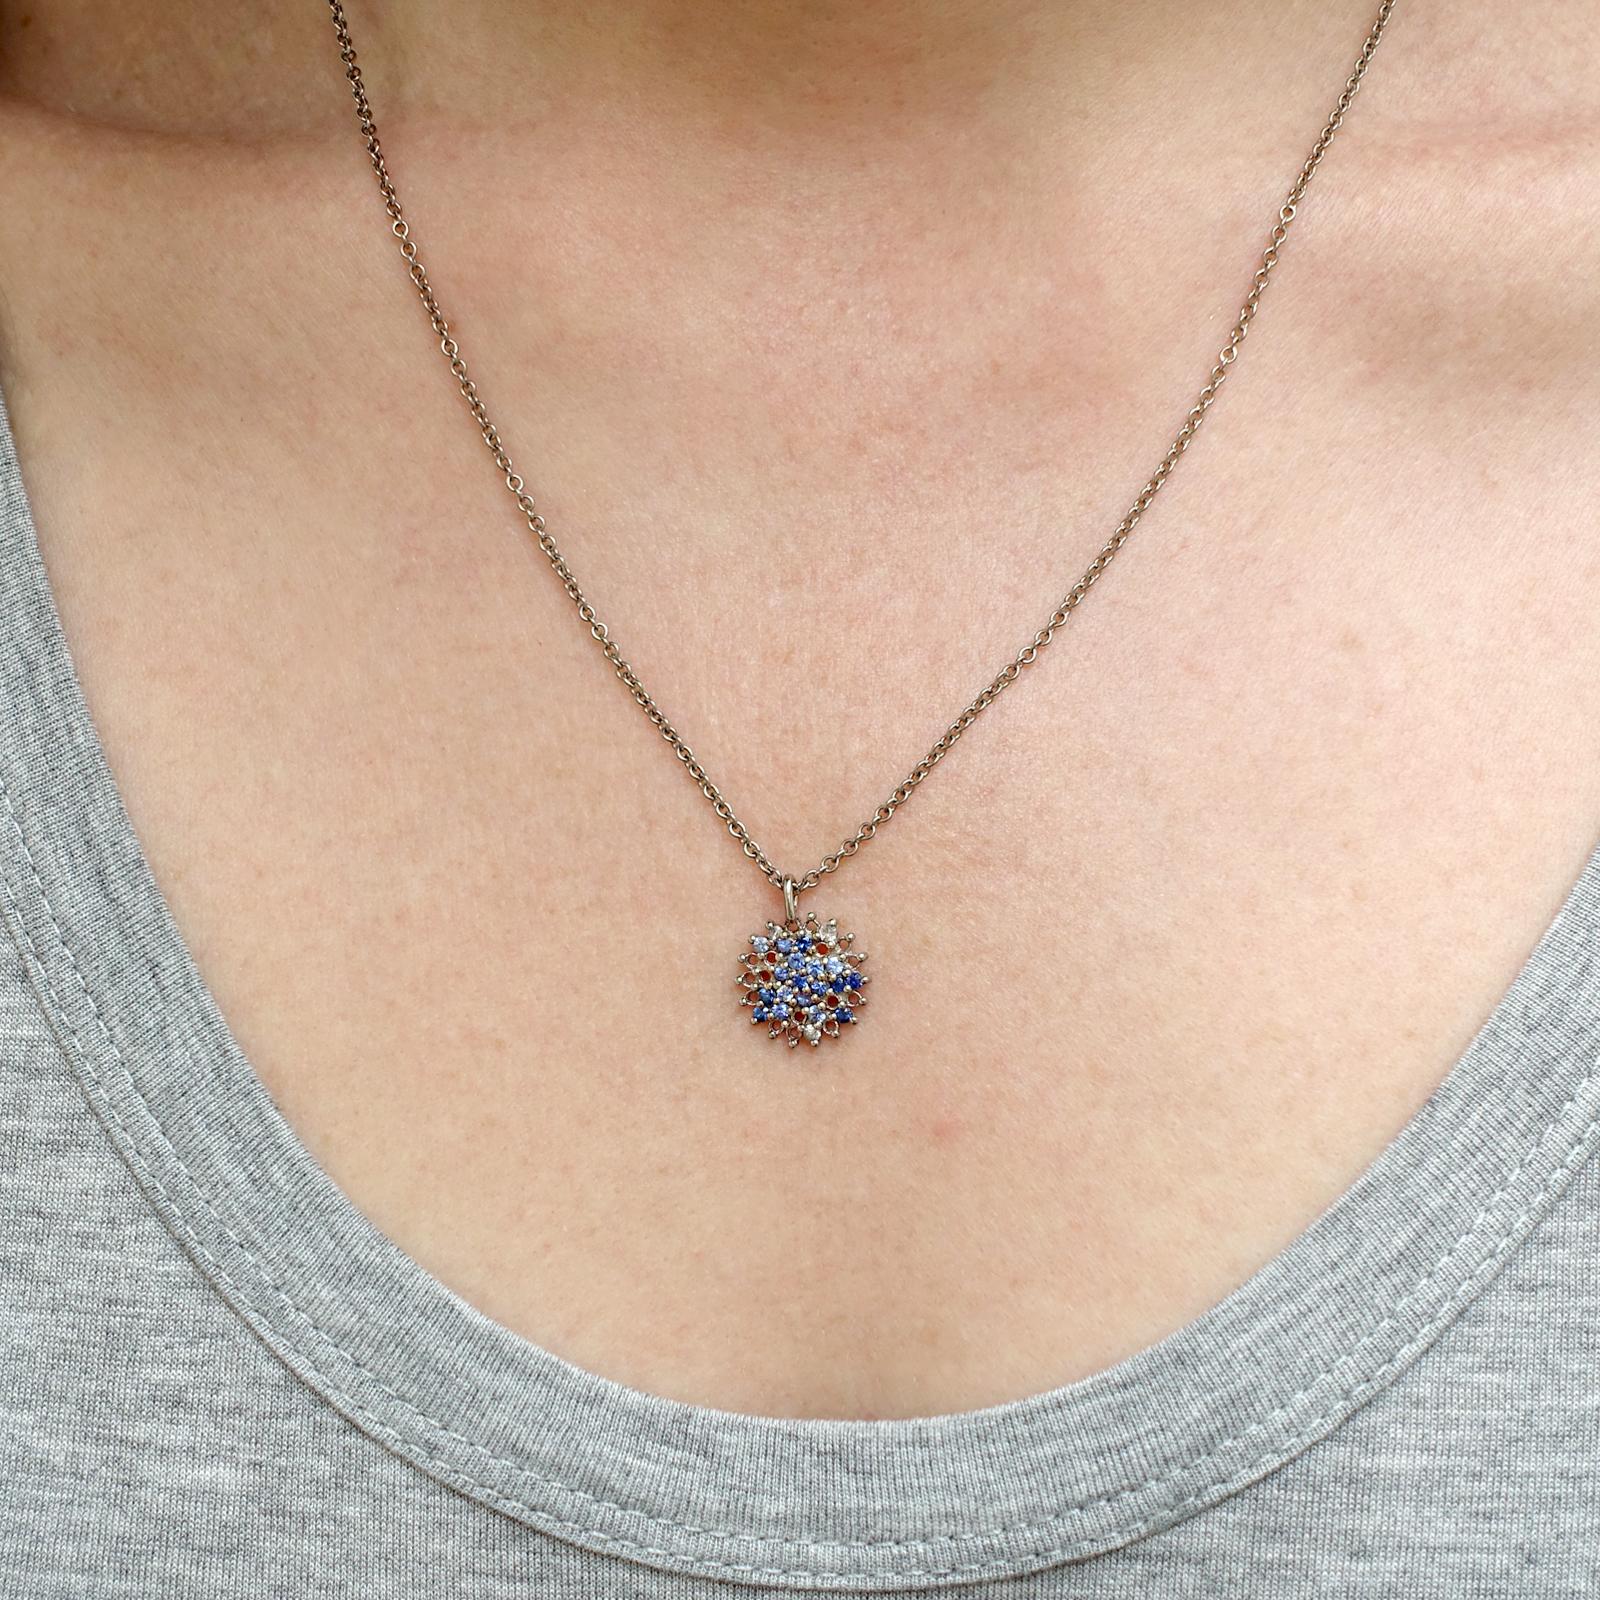 Large Pendant – Blue Sapphire and White Diamond, 18ct White Gold